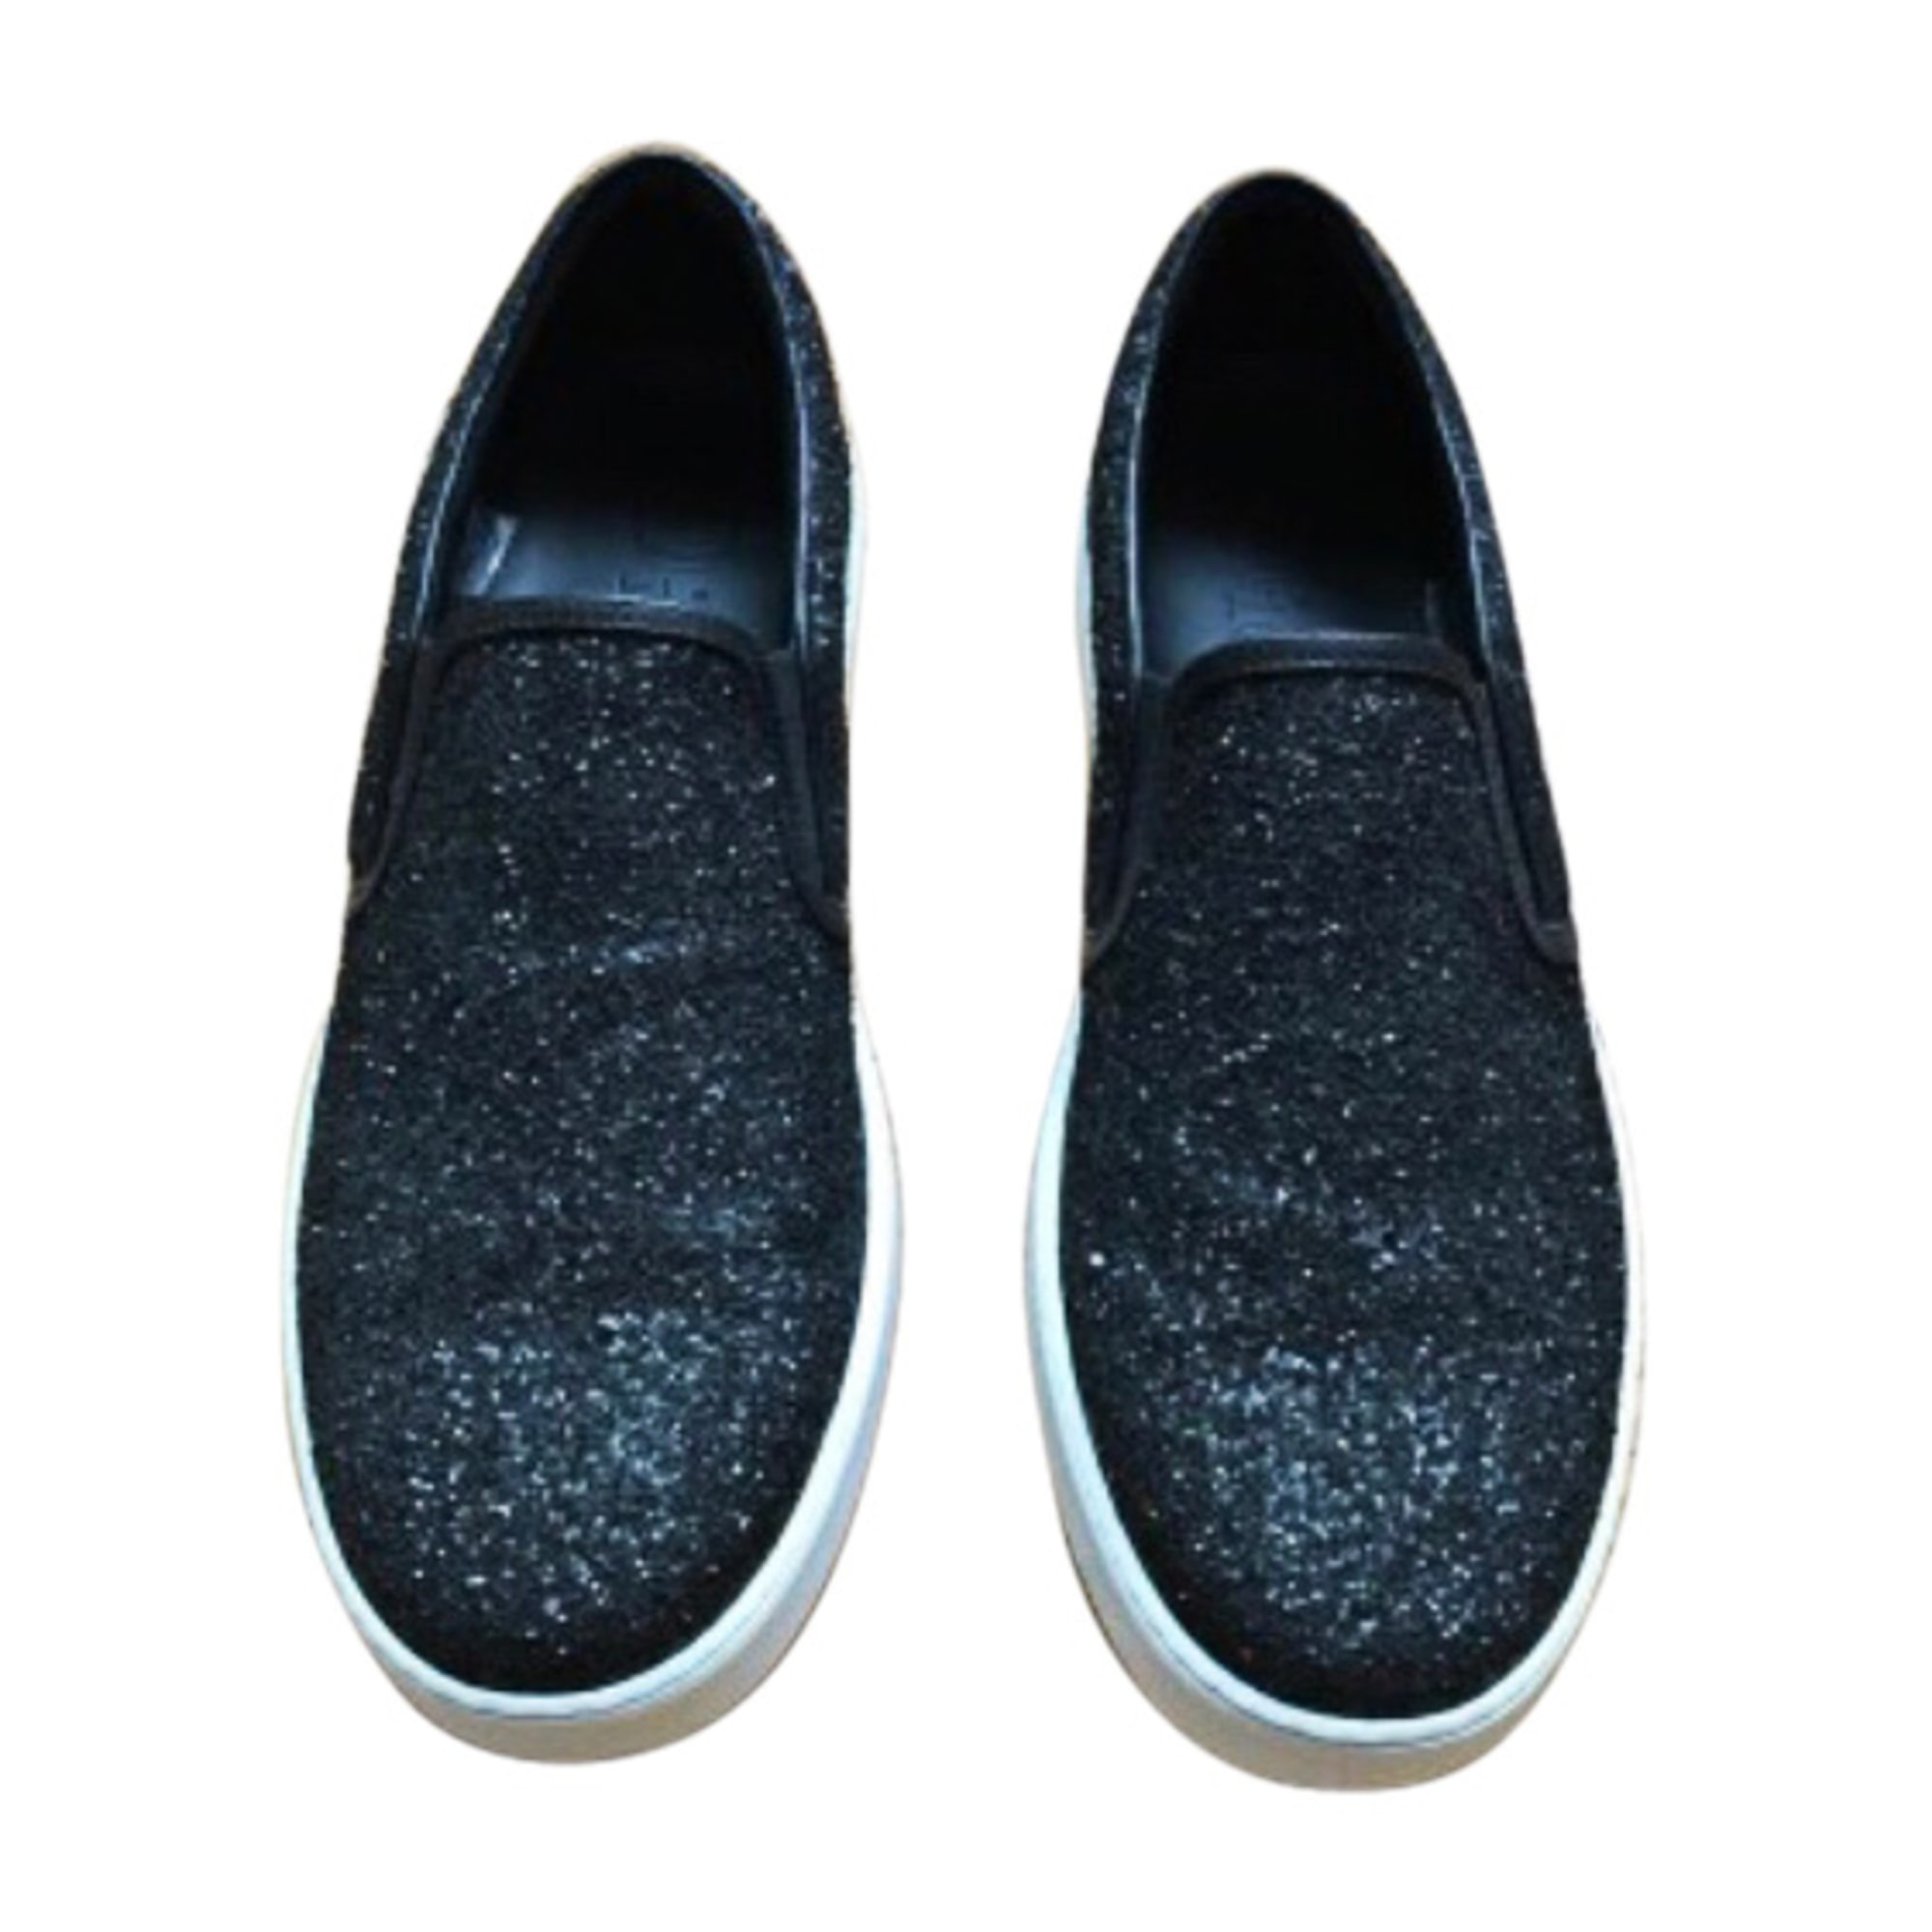 ec0ab65508d Sneakers DIOR HOMME 42 black - 7774089